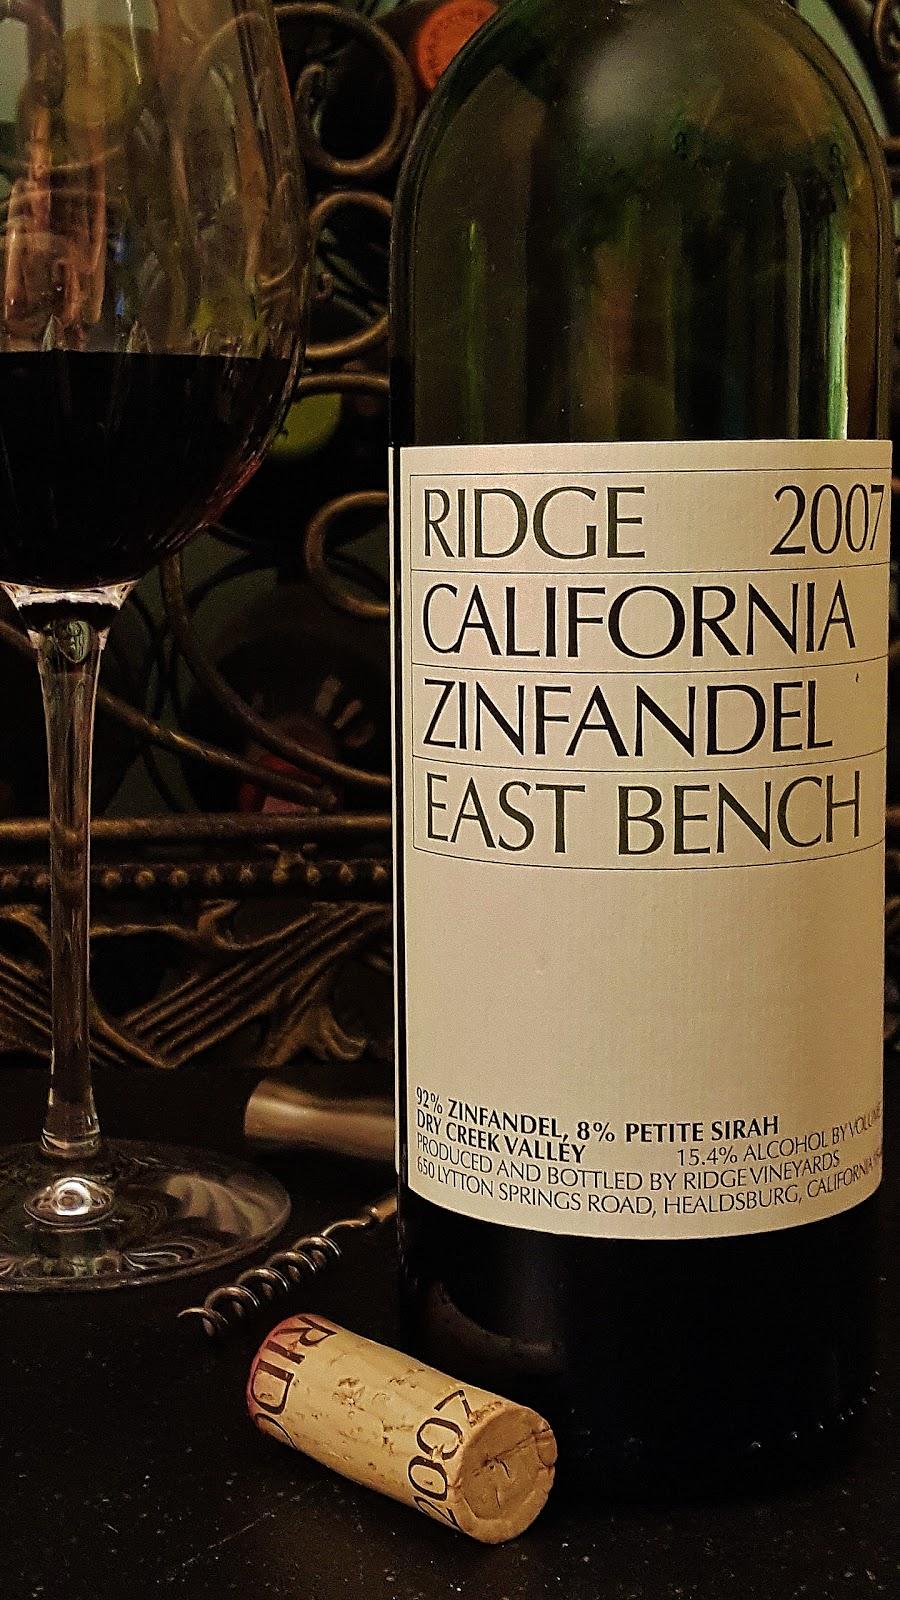 New Hampshire Wine Man Ridge East Bench 2007 Zinfandel